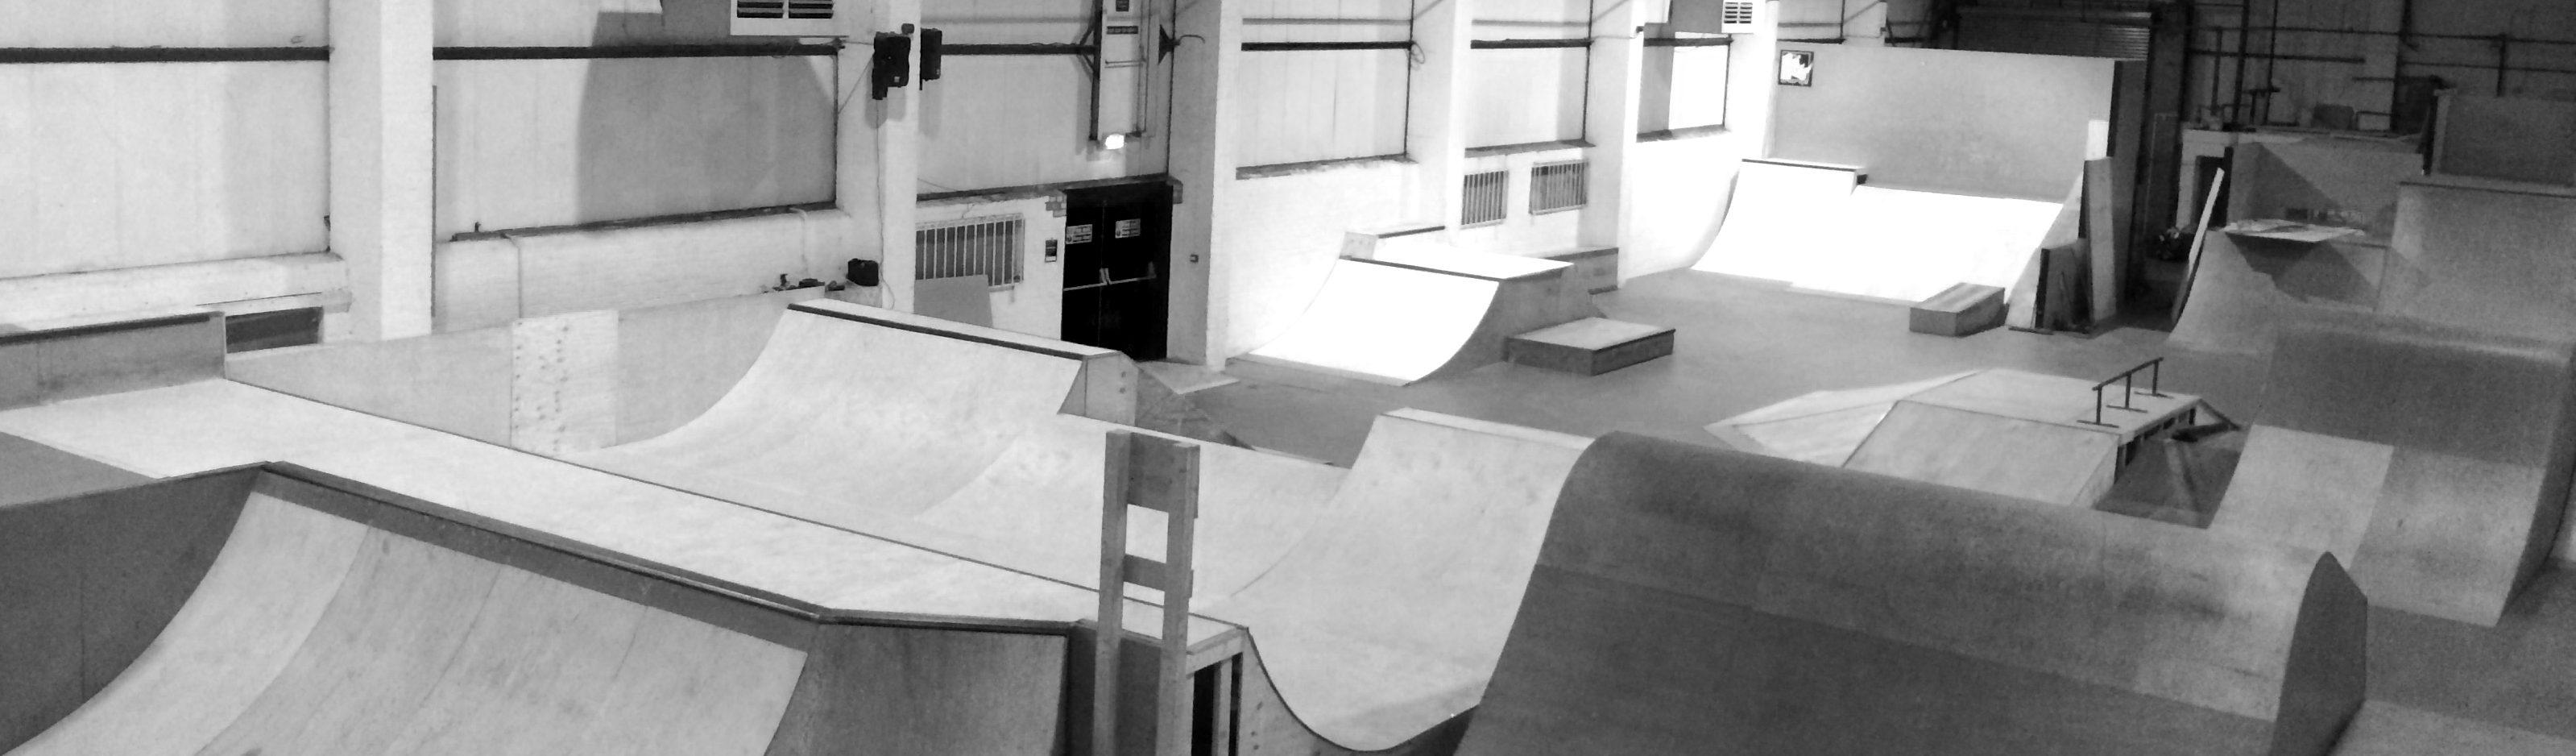 Norwich Screen Printers Funds Skatepark